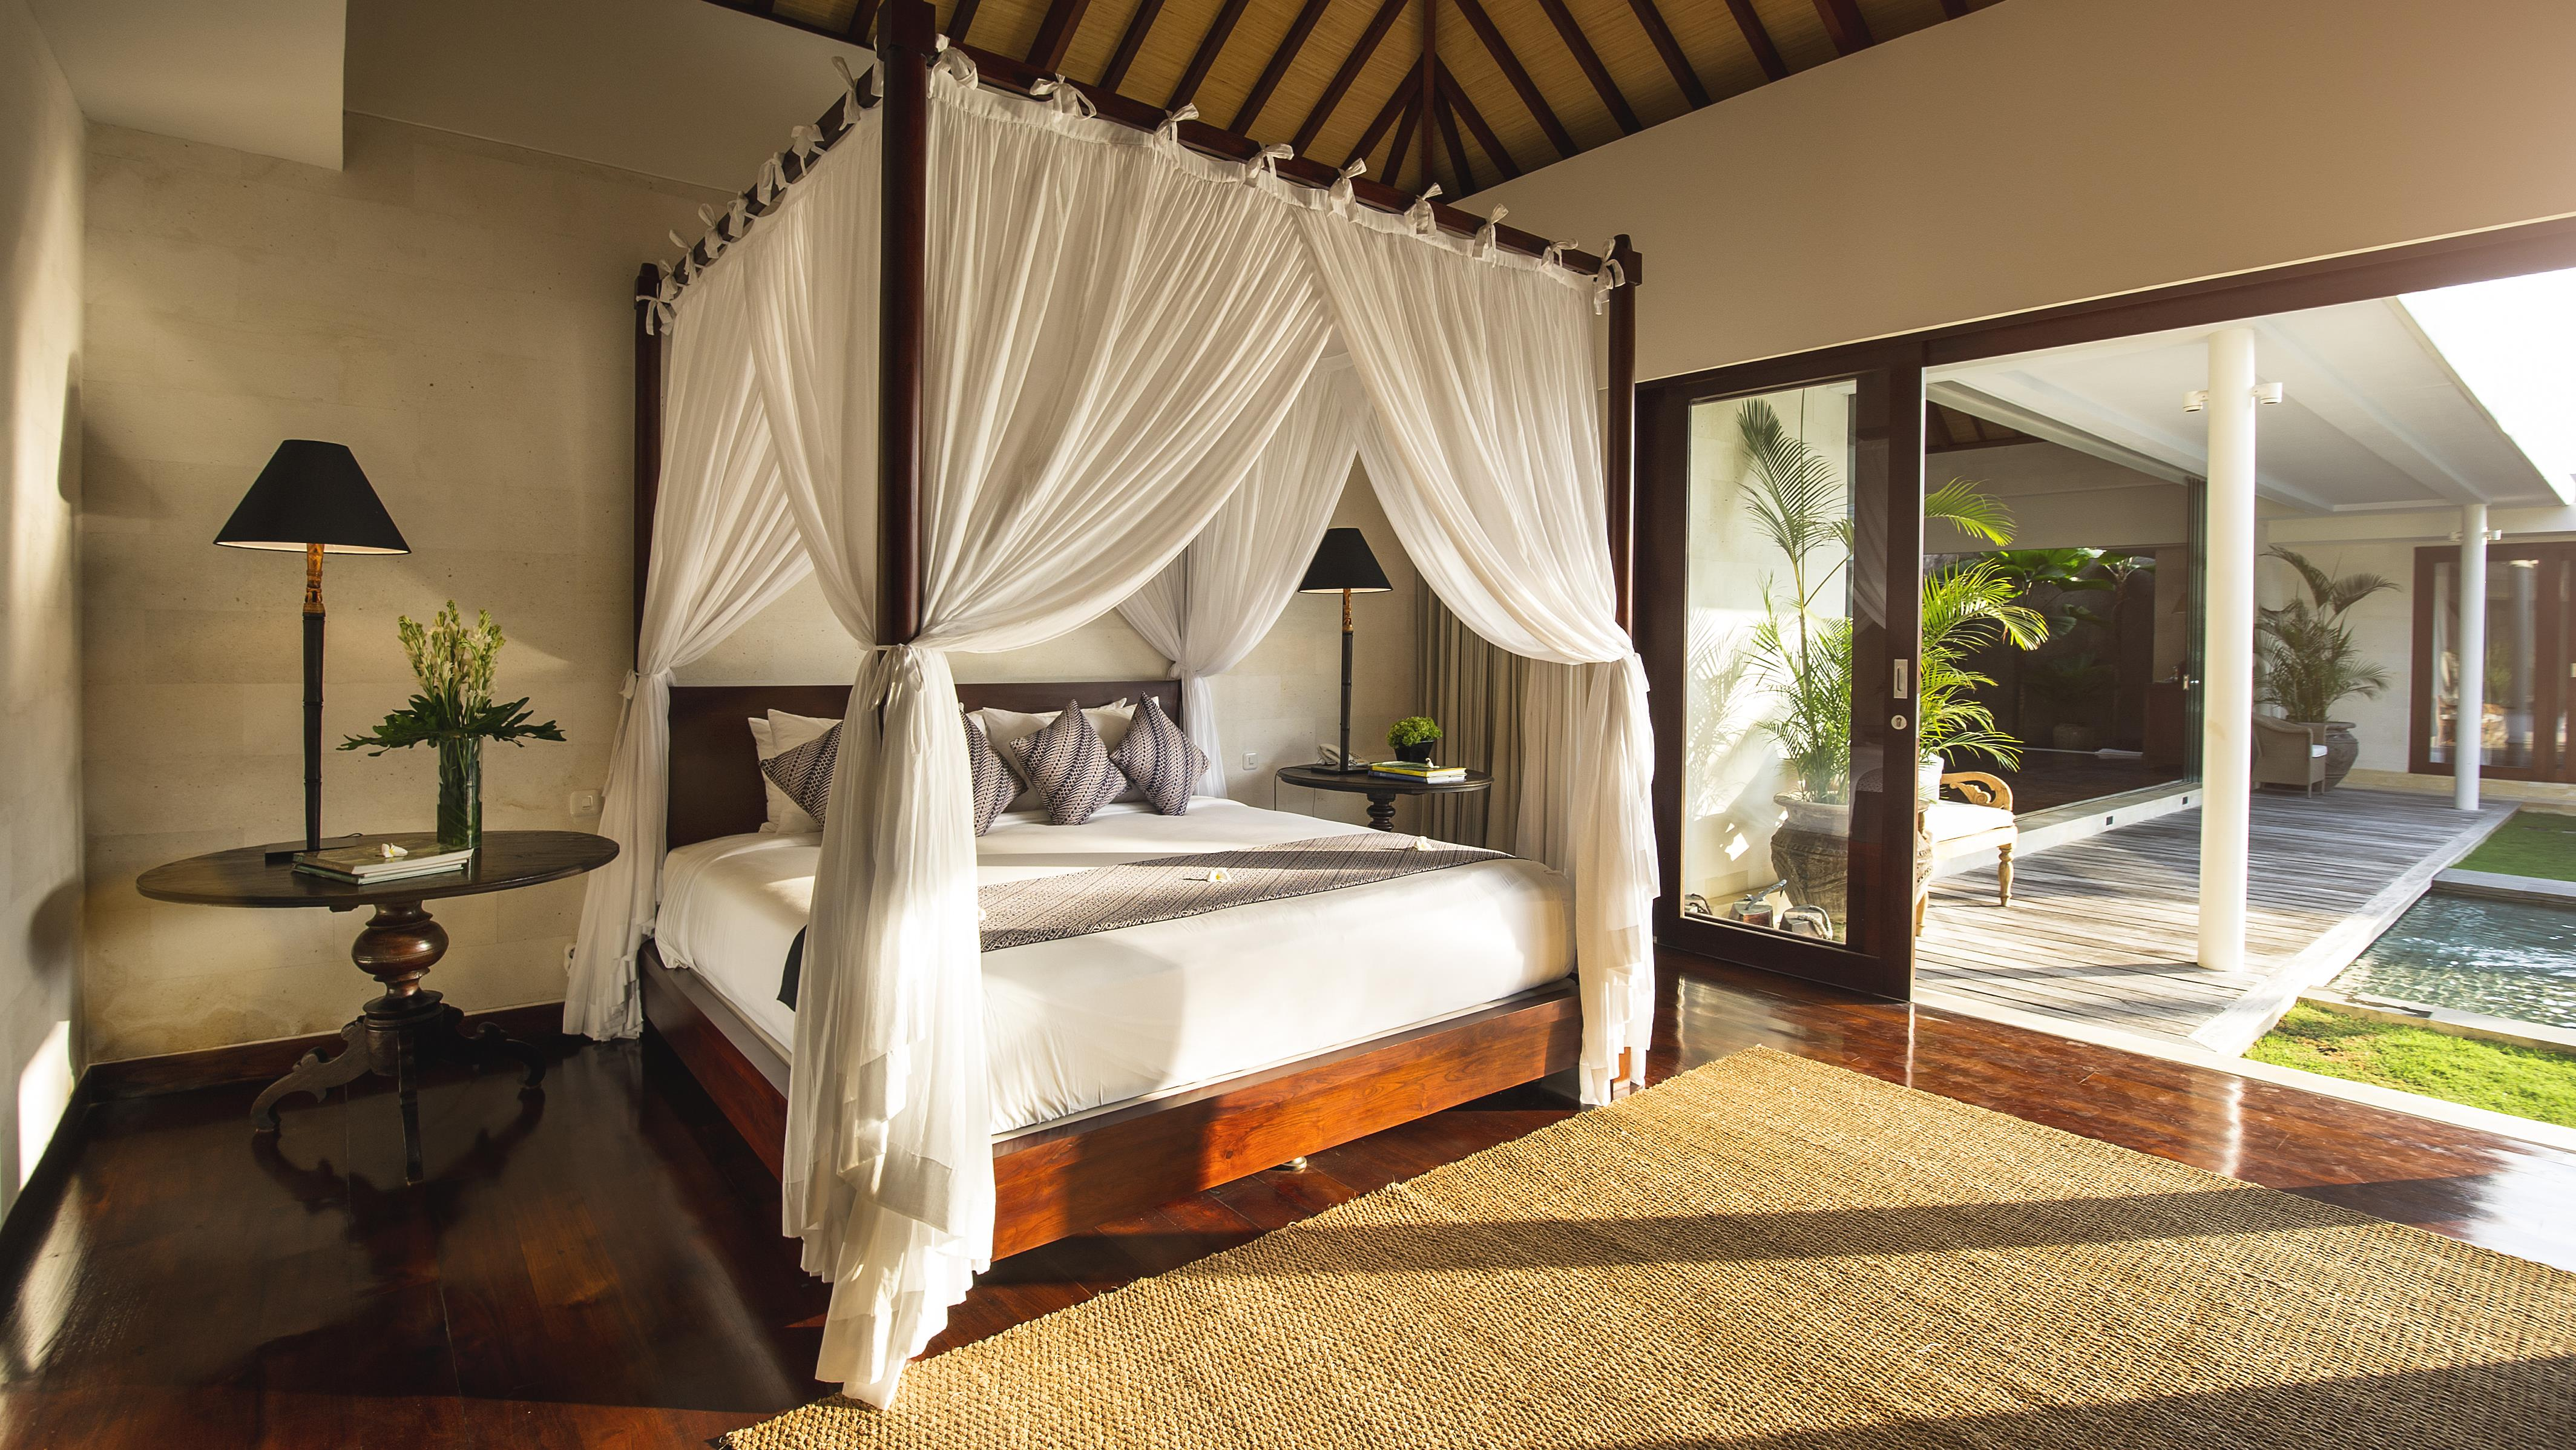 Bedroom with Pool View - Villa Alabali - Seminyak, Bali